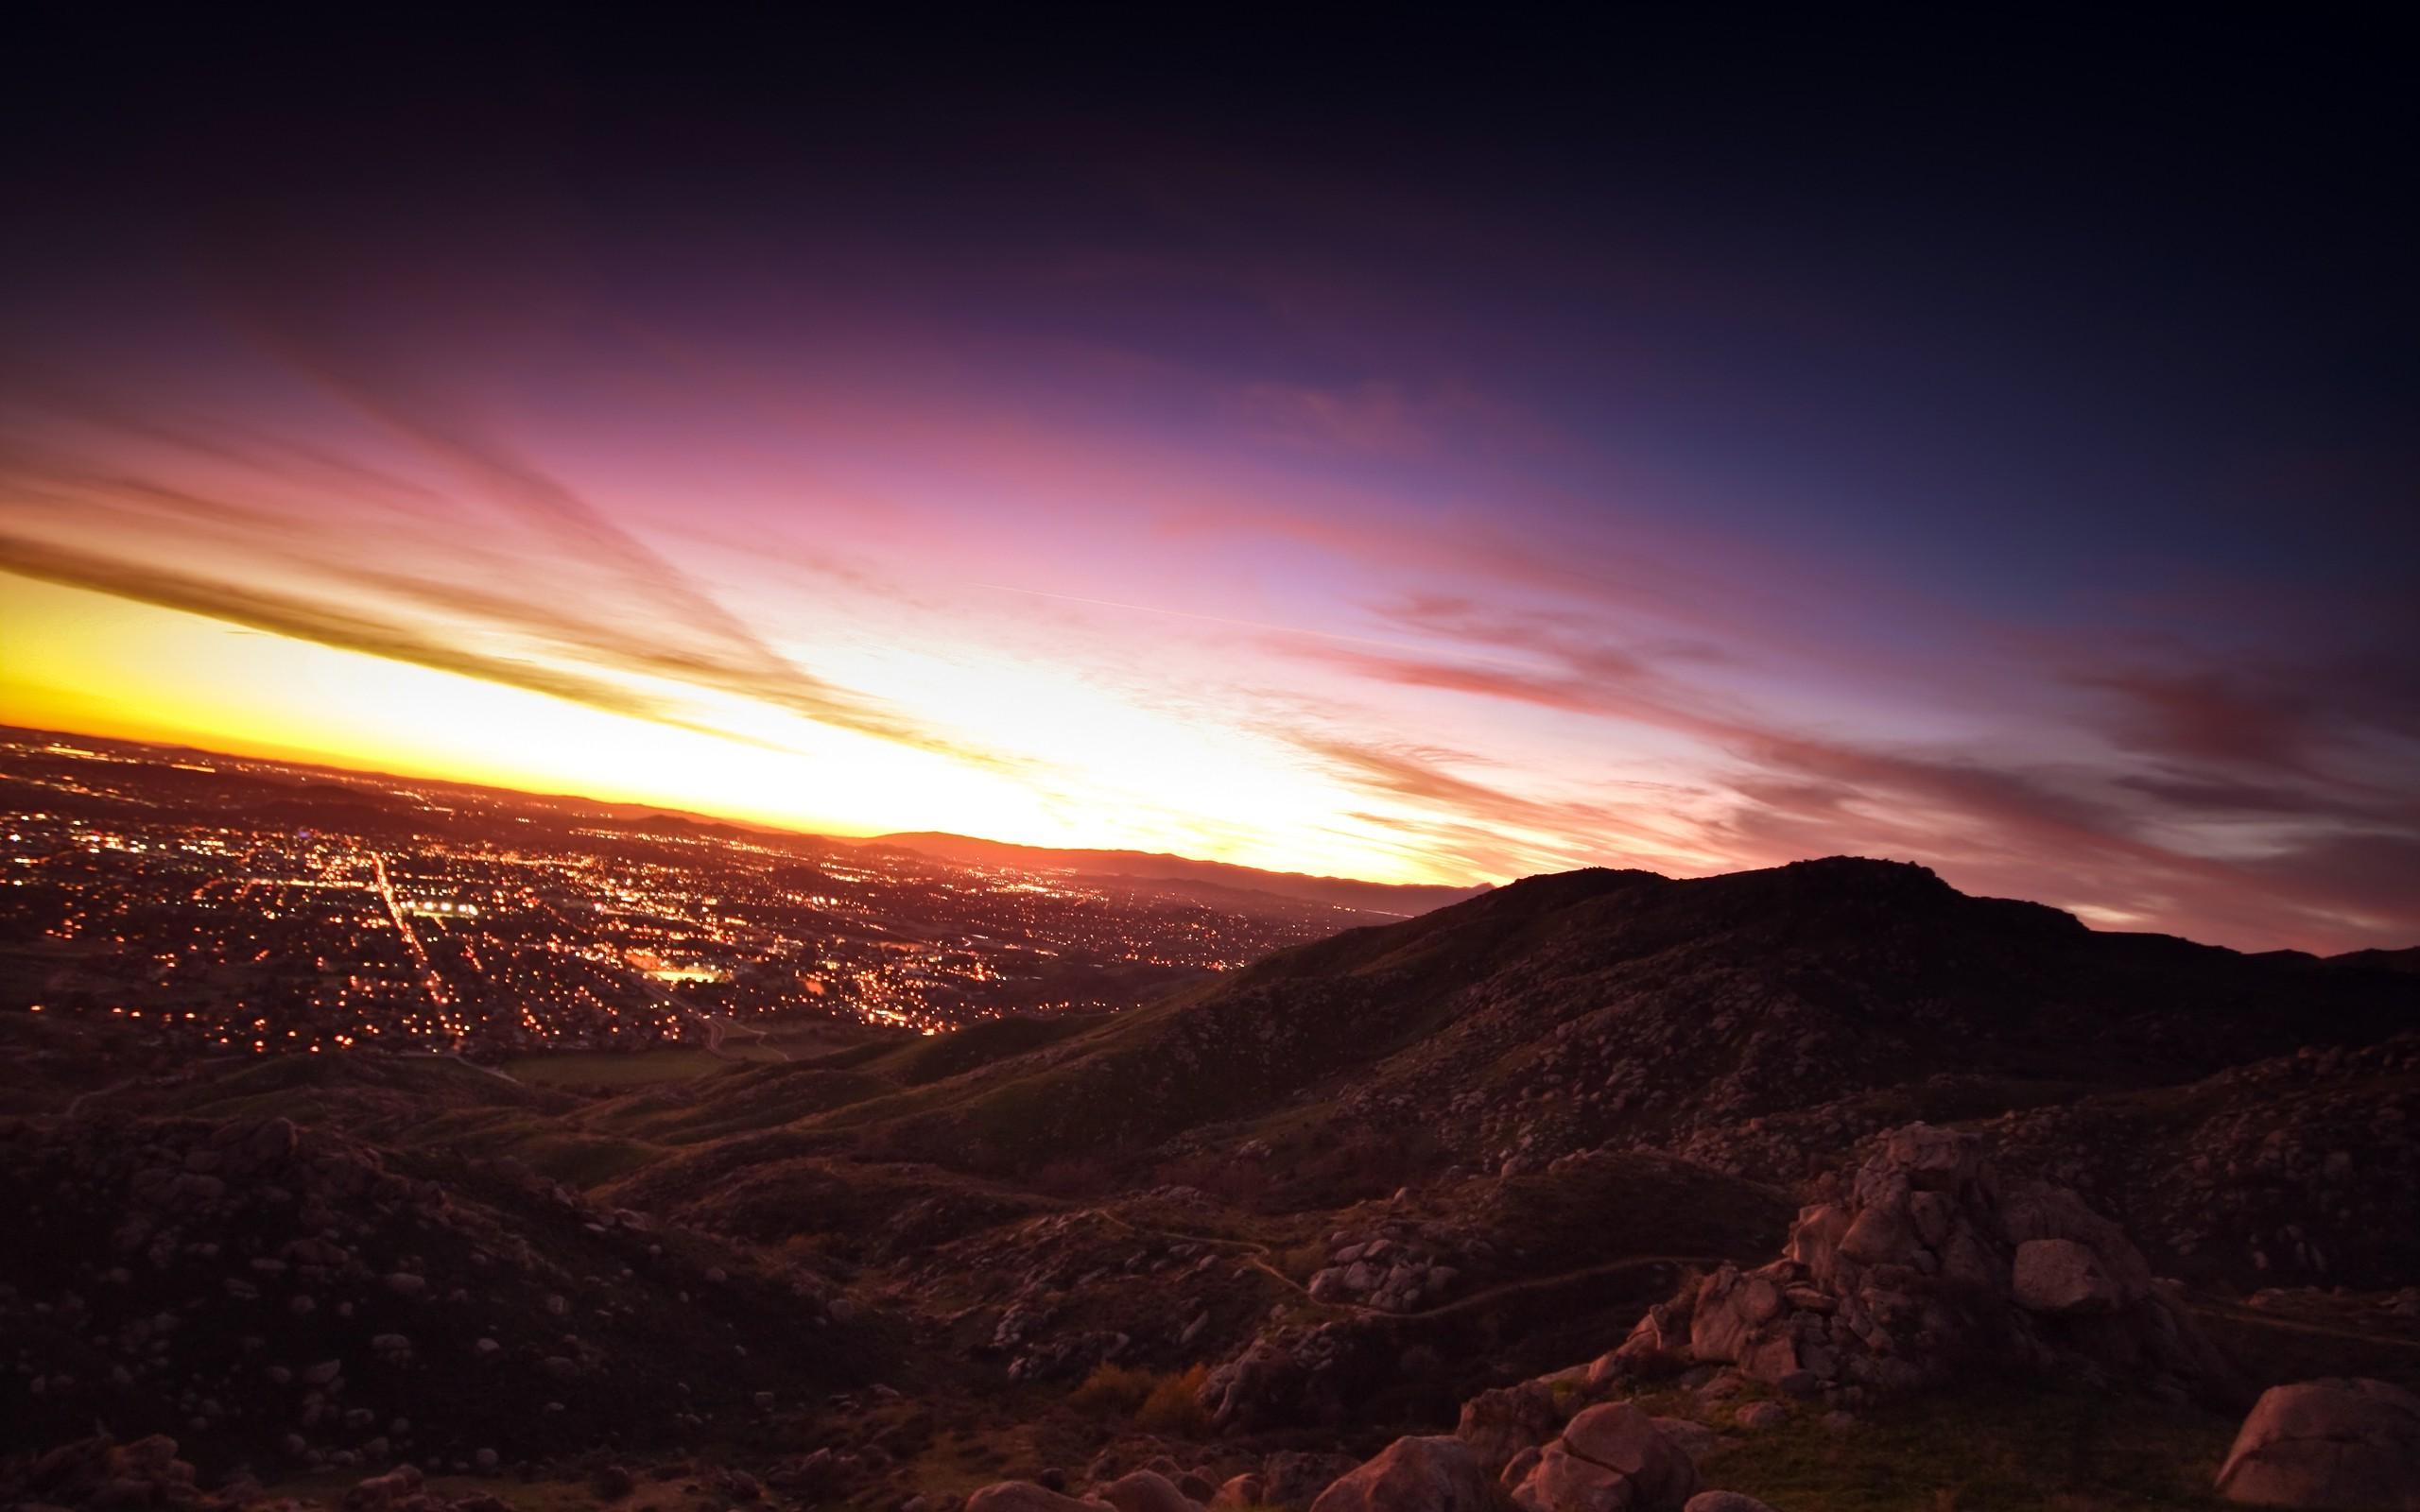 city sunset wallpaper 7106 - photo #10